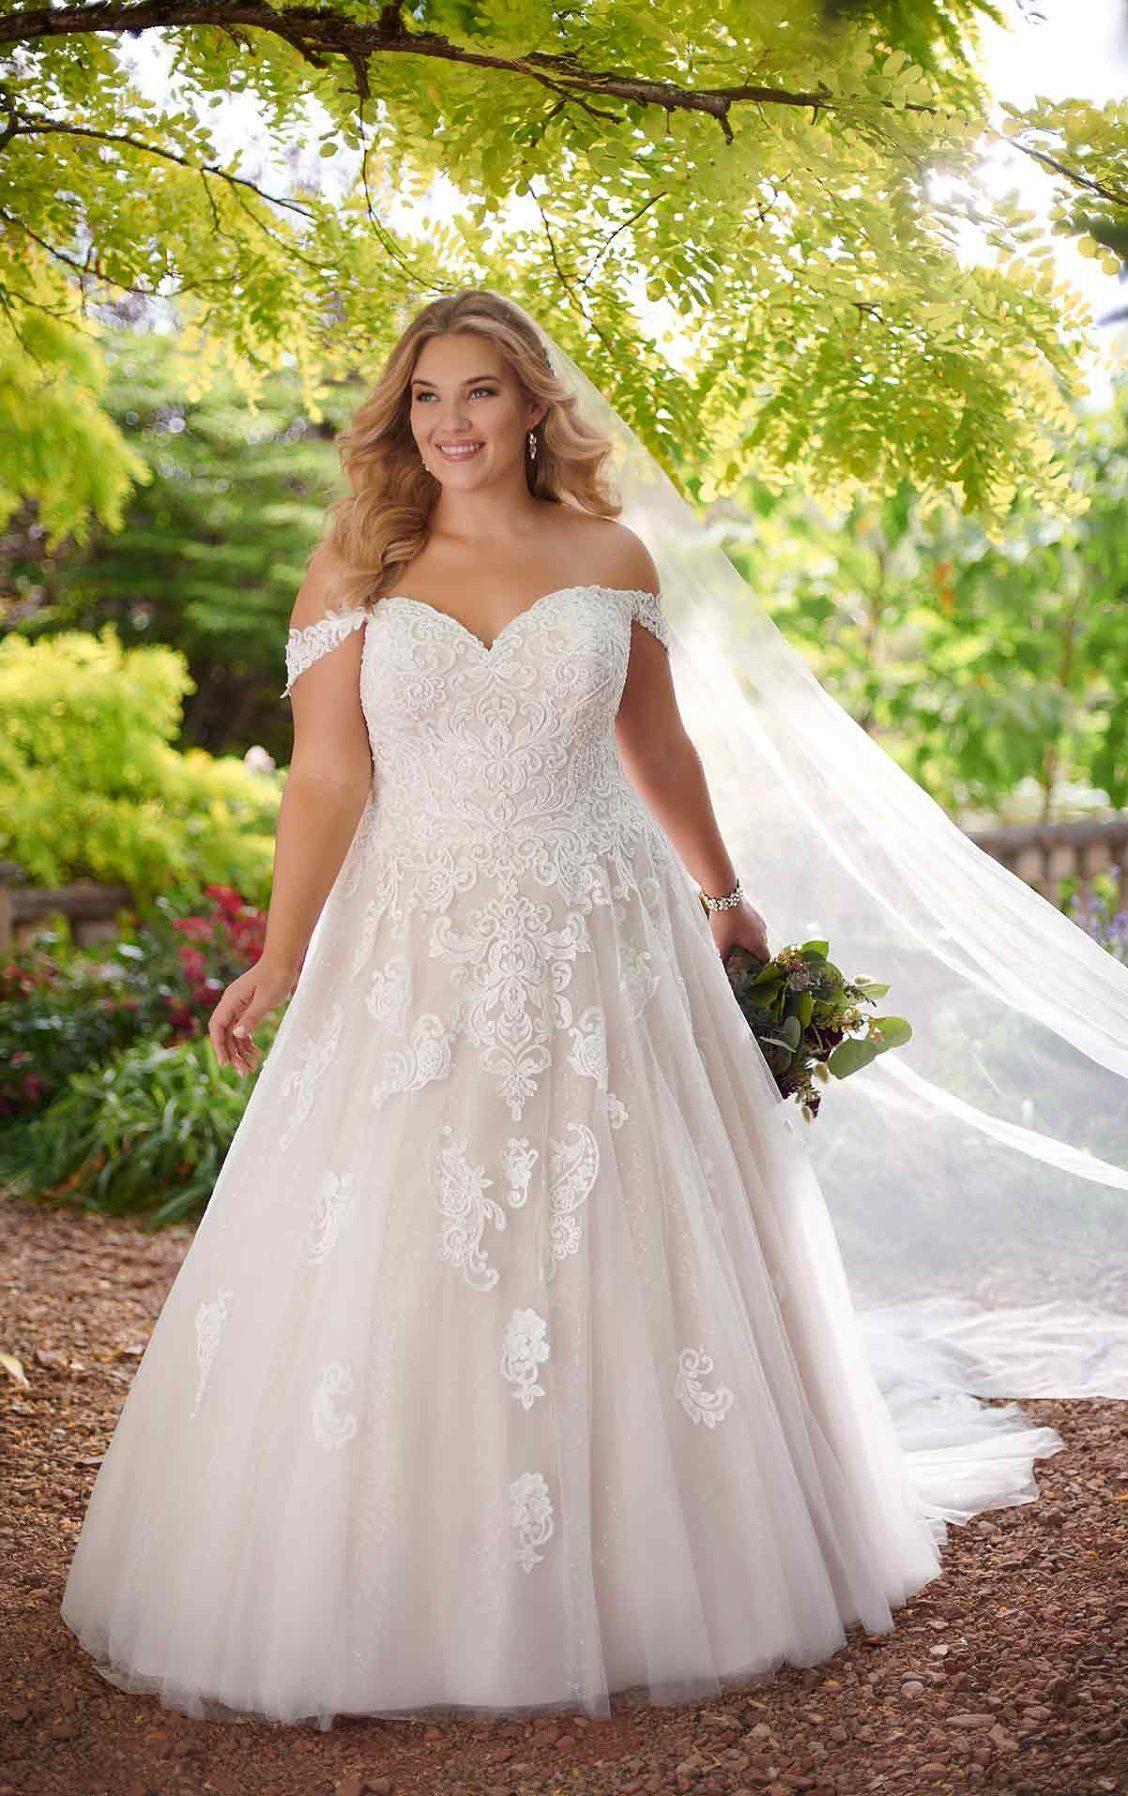 D2605 Lace Ballgown Plus Size Wedding Dress By Essense Of Australia Ball Gowns Wedding Wedding Dresses Lace Ballgown Wedding Dress Inspiration [ 1796 x 1128 Pixel ]